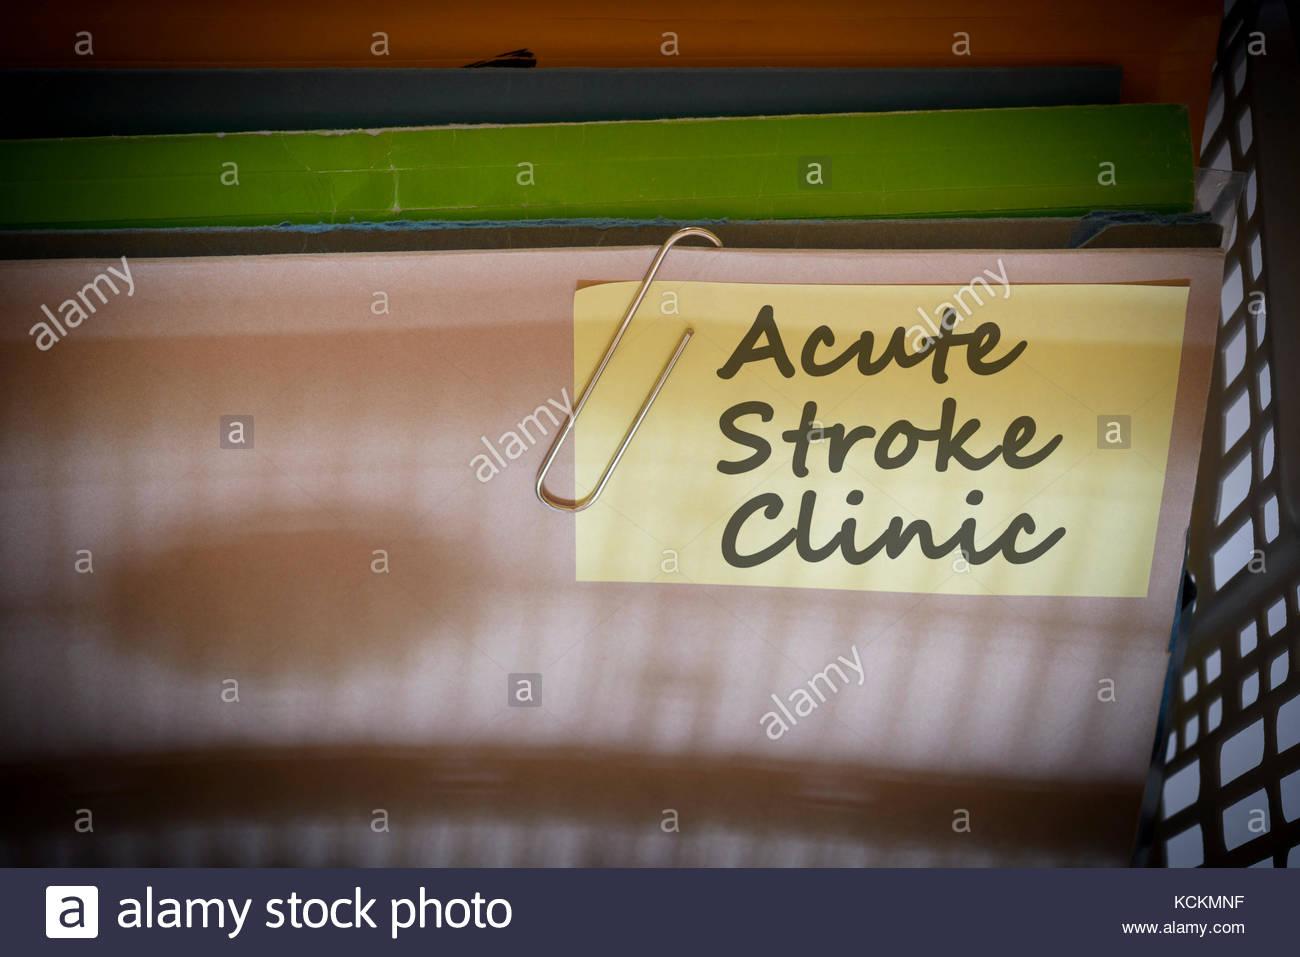 Acute Stroke Clinic written on document folder, Dorset, England. - Stock Image